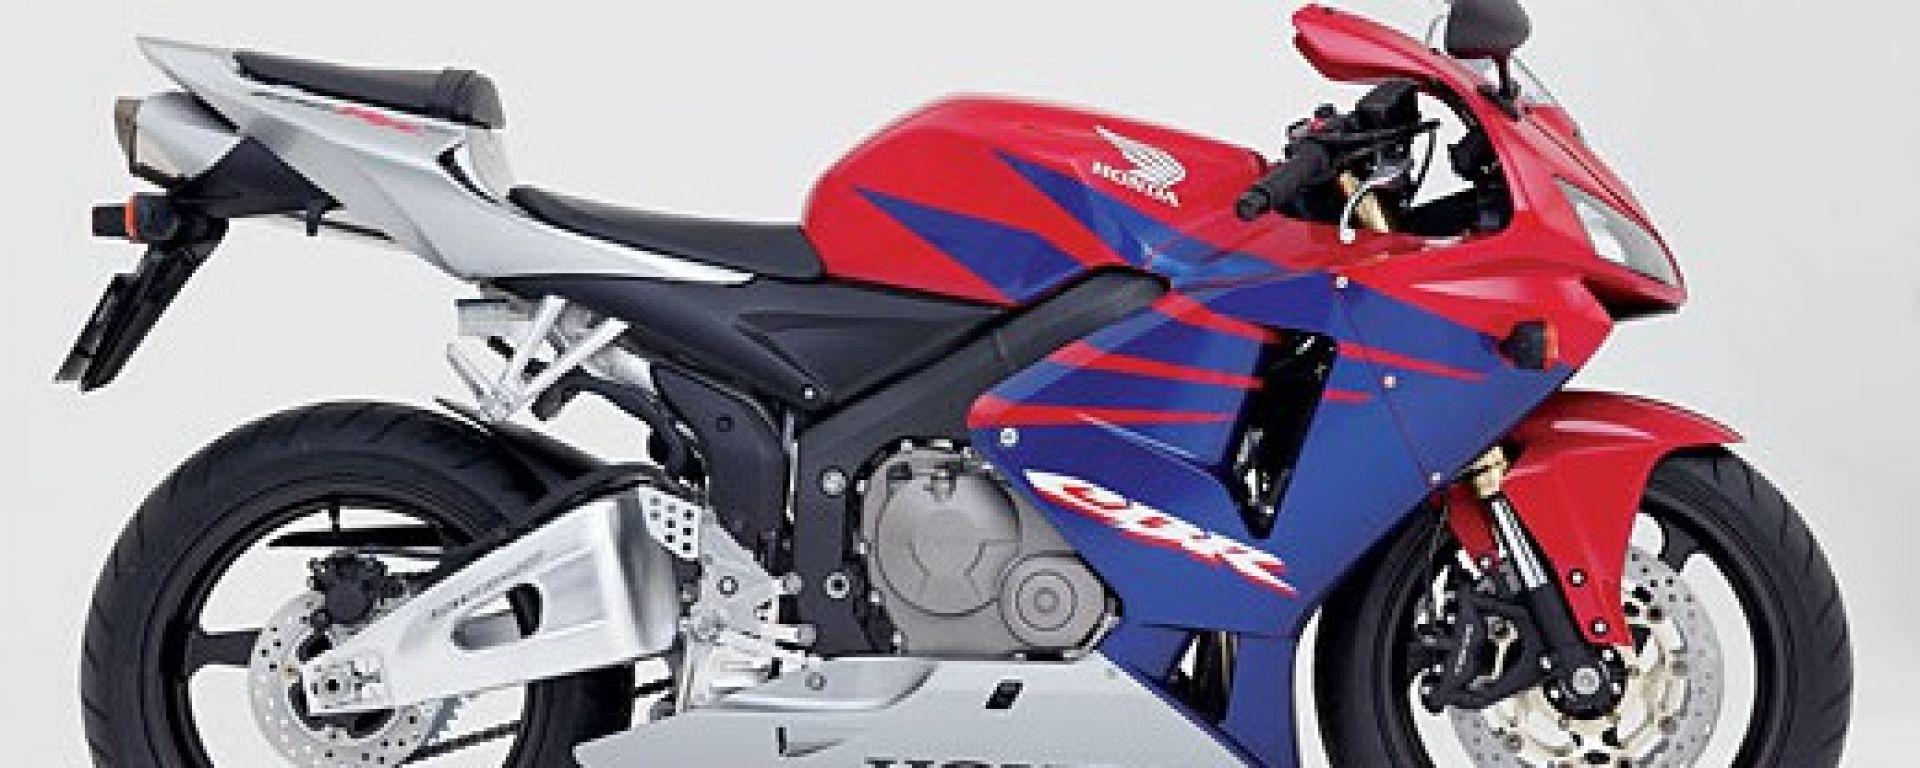 2005 Honda CBR 600 RR: pics, specs and information